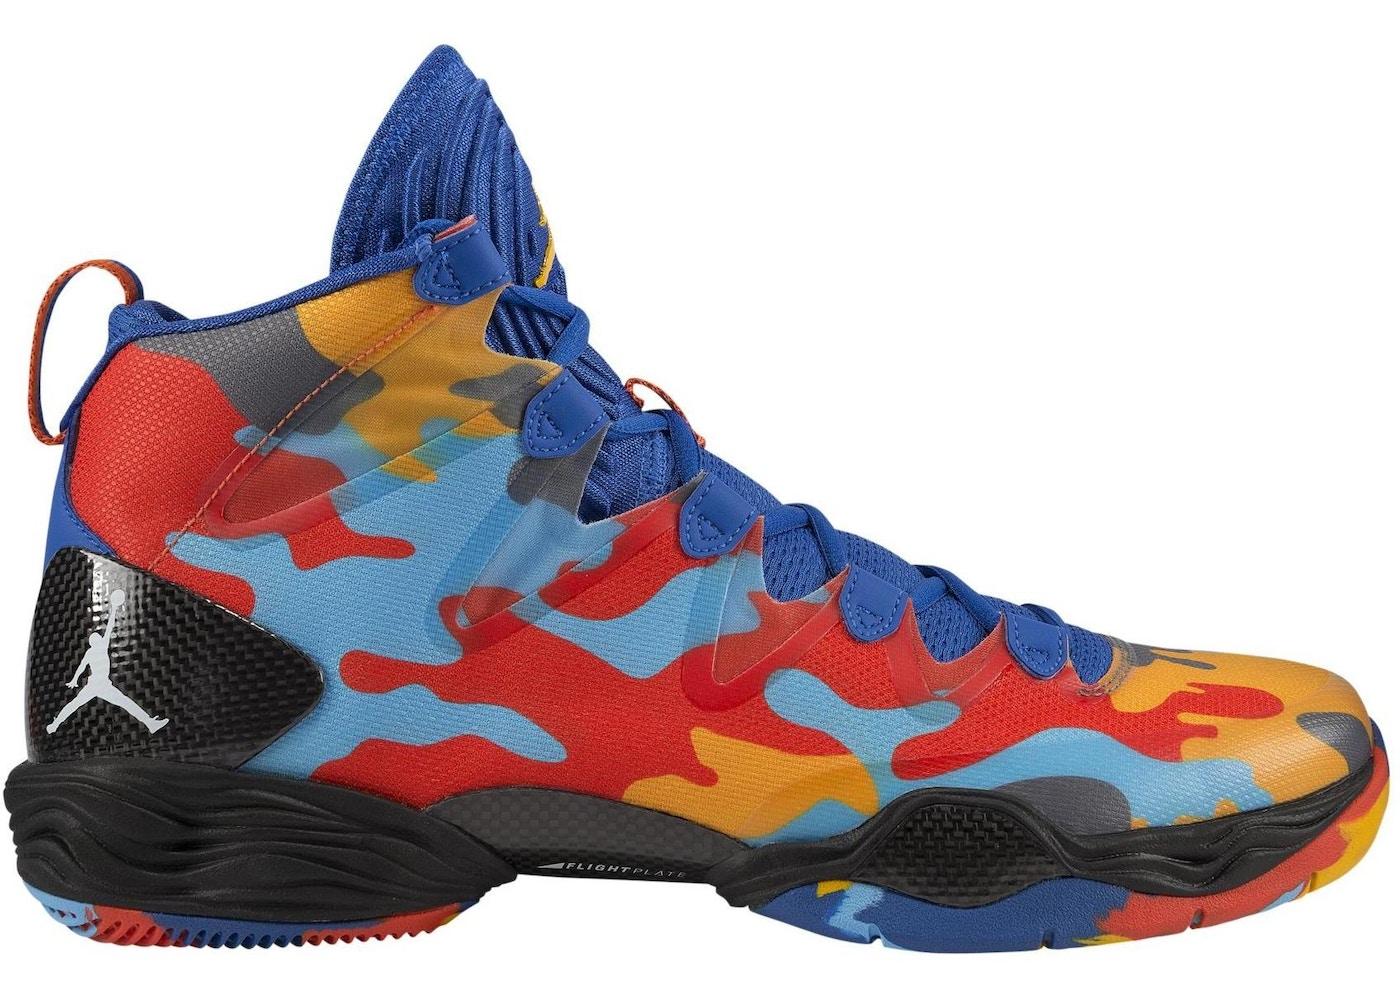 e507170bdfb Buy Air Jordan 28 Shoes & Deadstock Sneakers